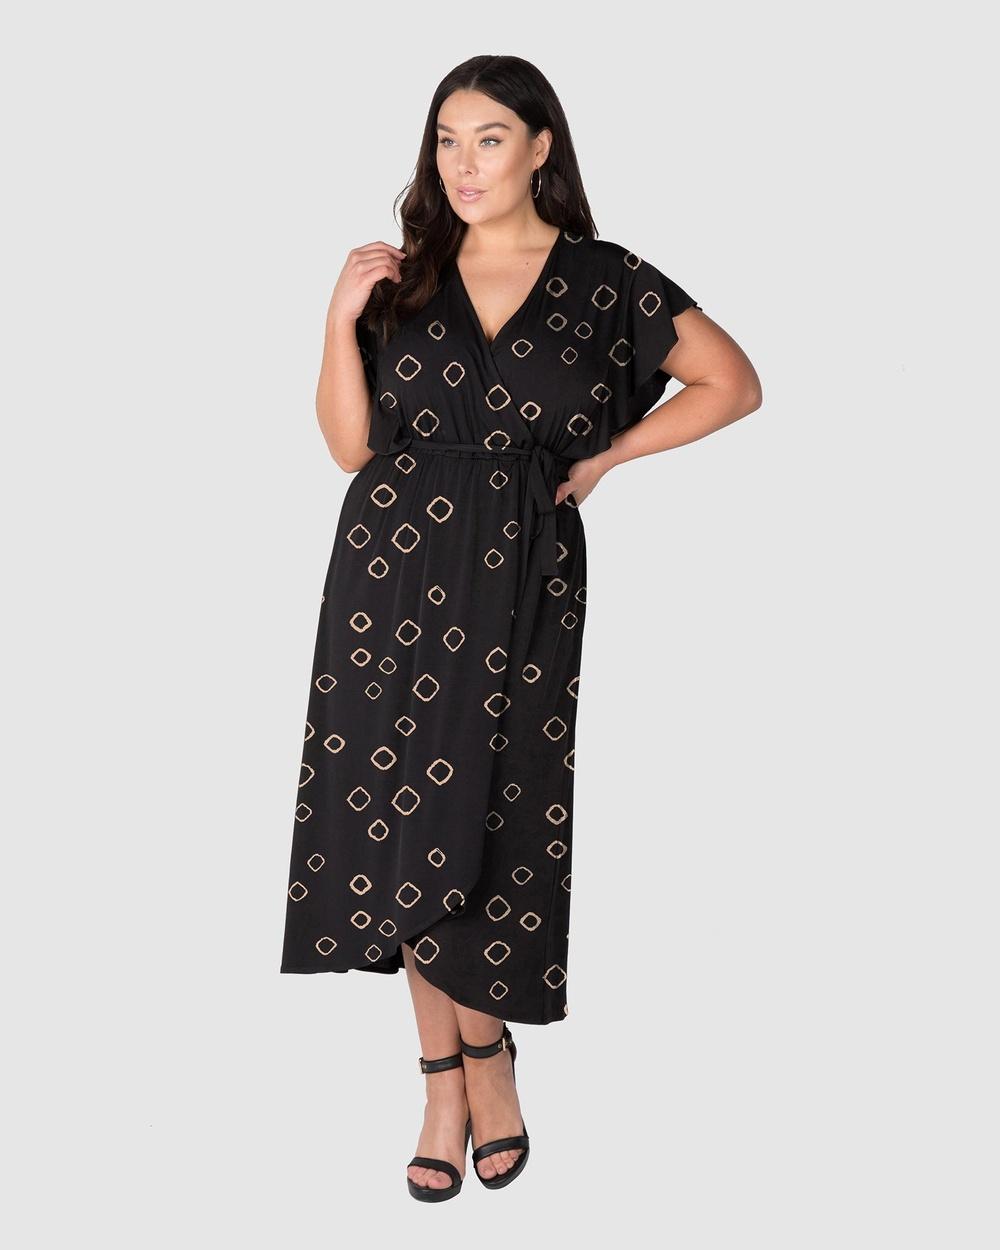 Love Your Wardrobe Shine Like A Diamond Print Knit Dress Printed Dresses Black/Gold Diamond